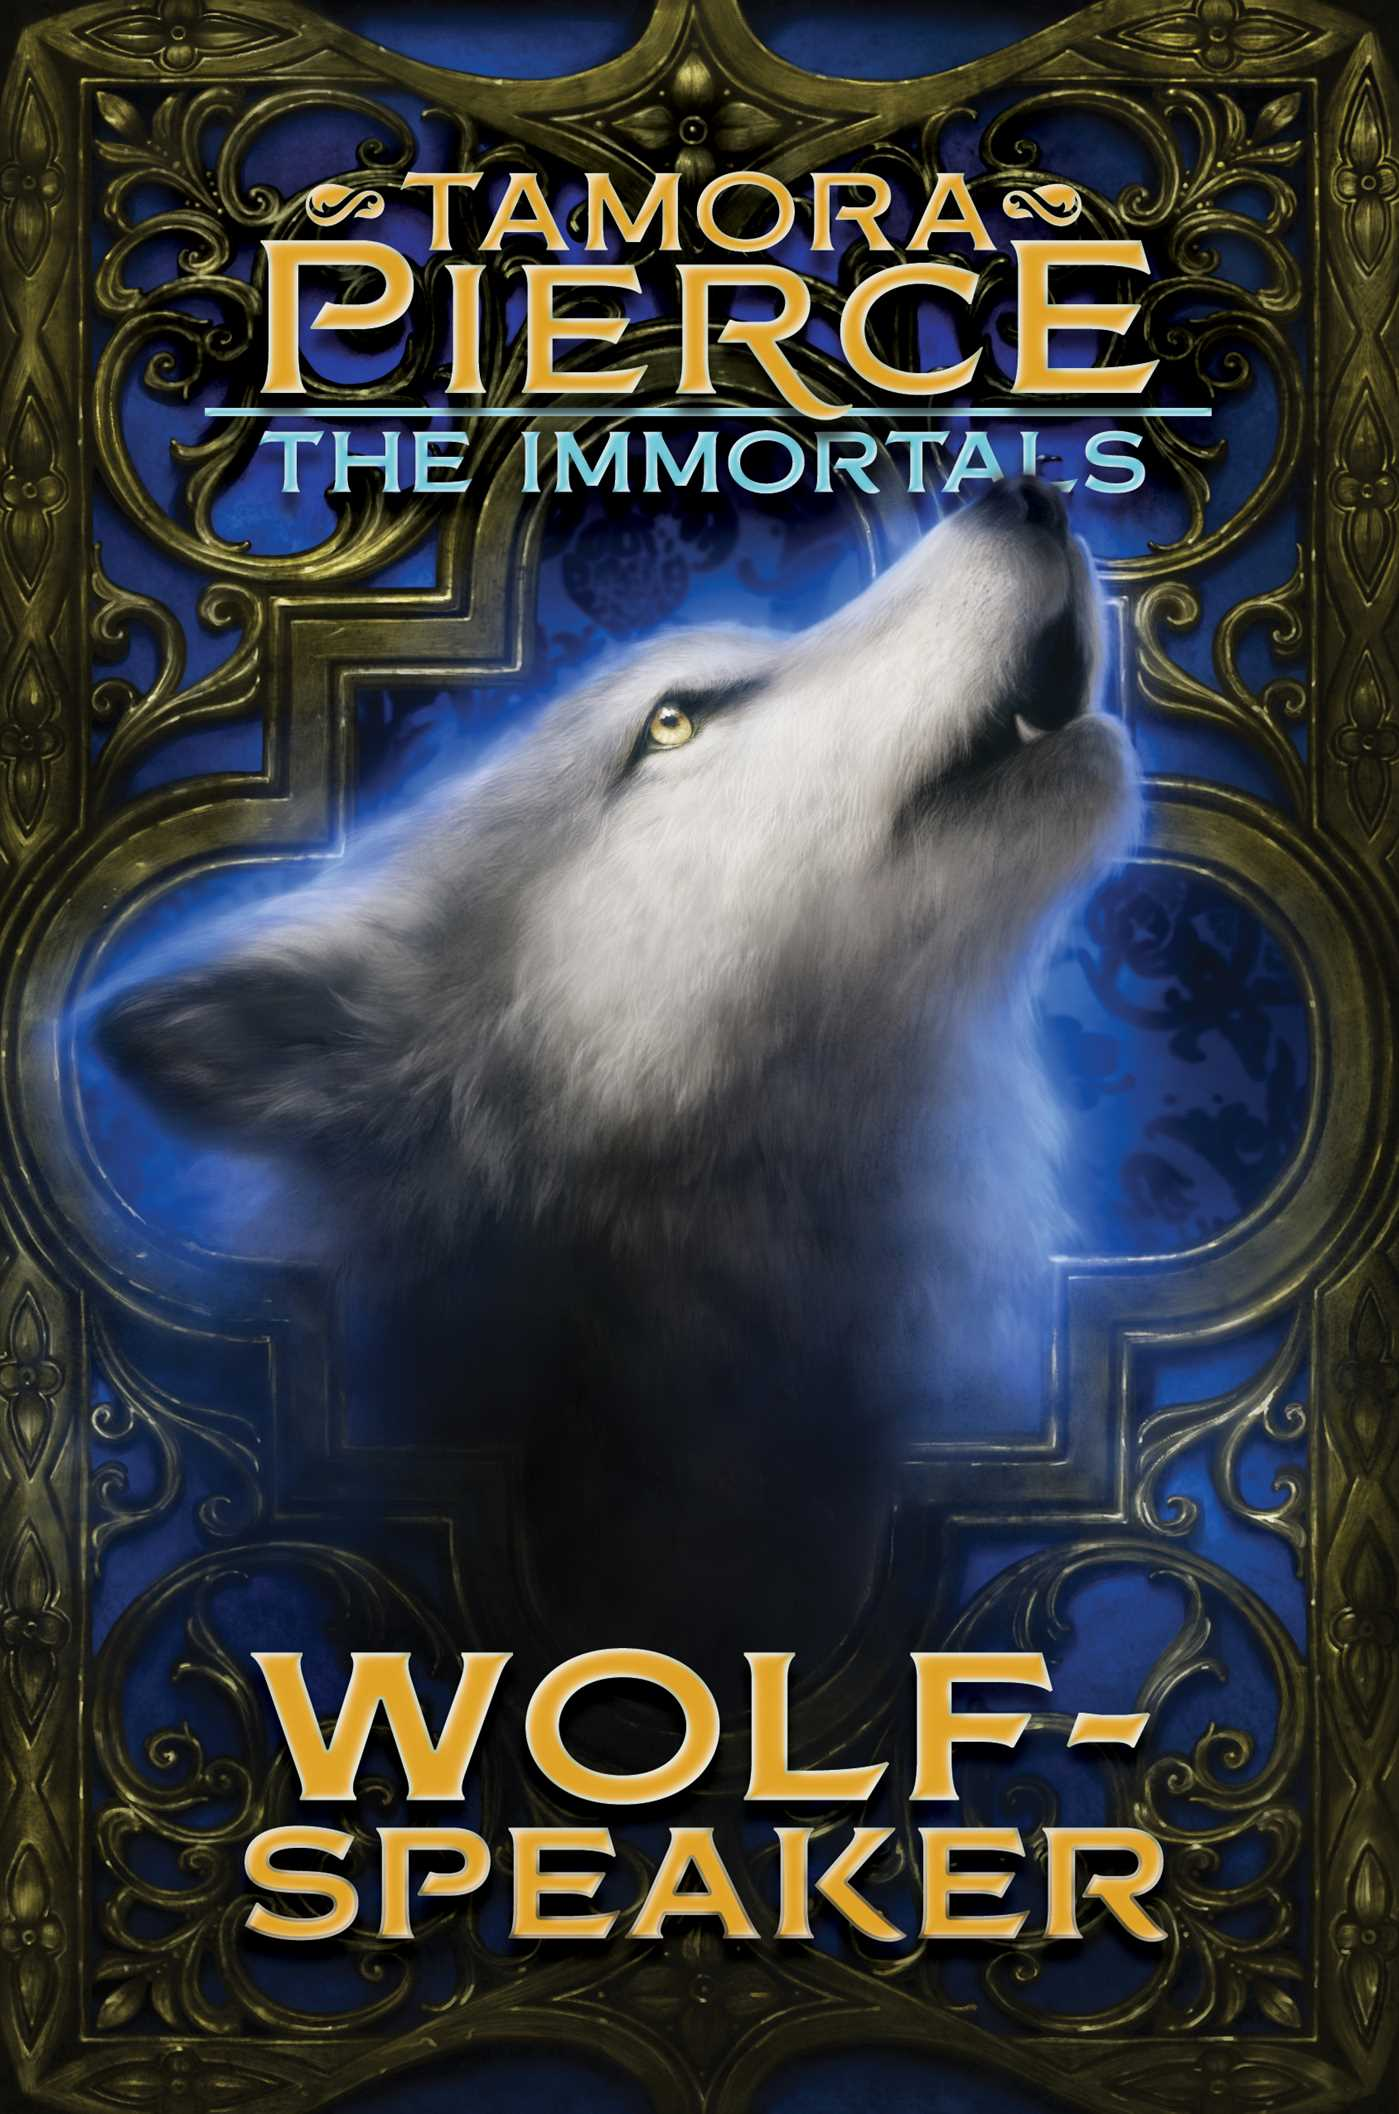 Wolf Speaker by Tamora Pierce